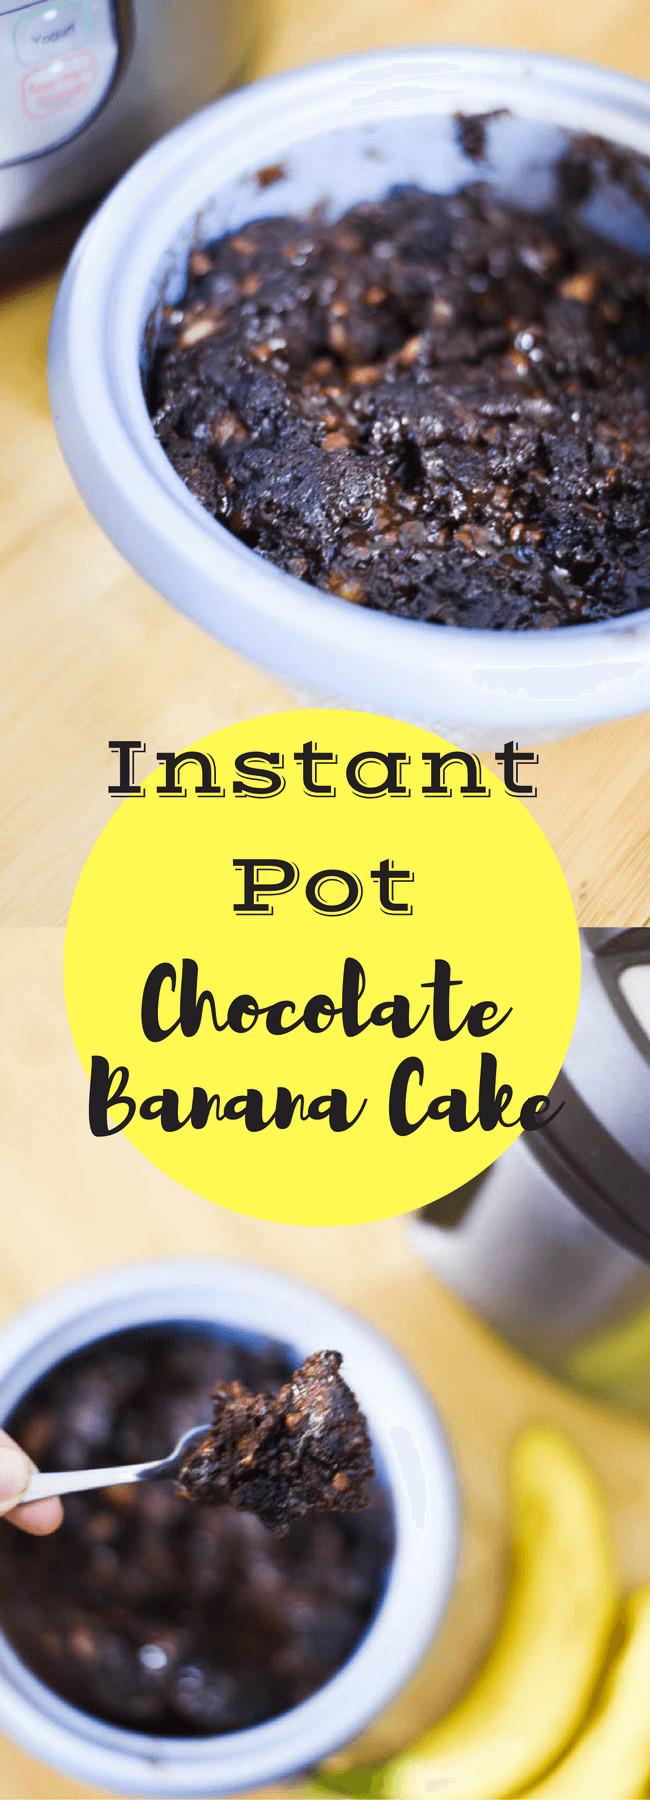 Instant Pot Healthy Desserts  Best Instapot Dessert Recipes Sweets in Minutes